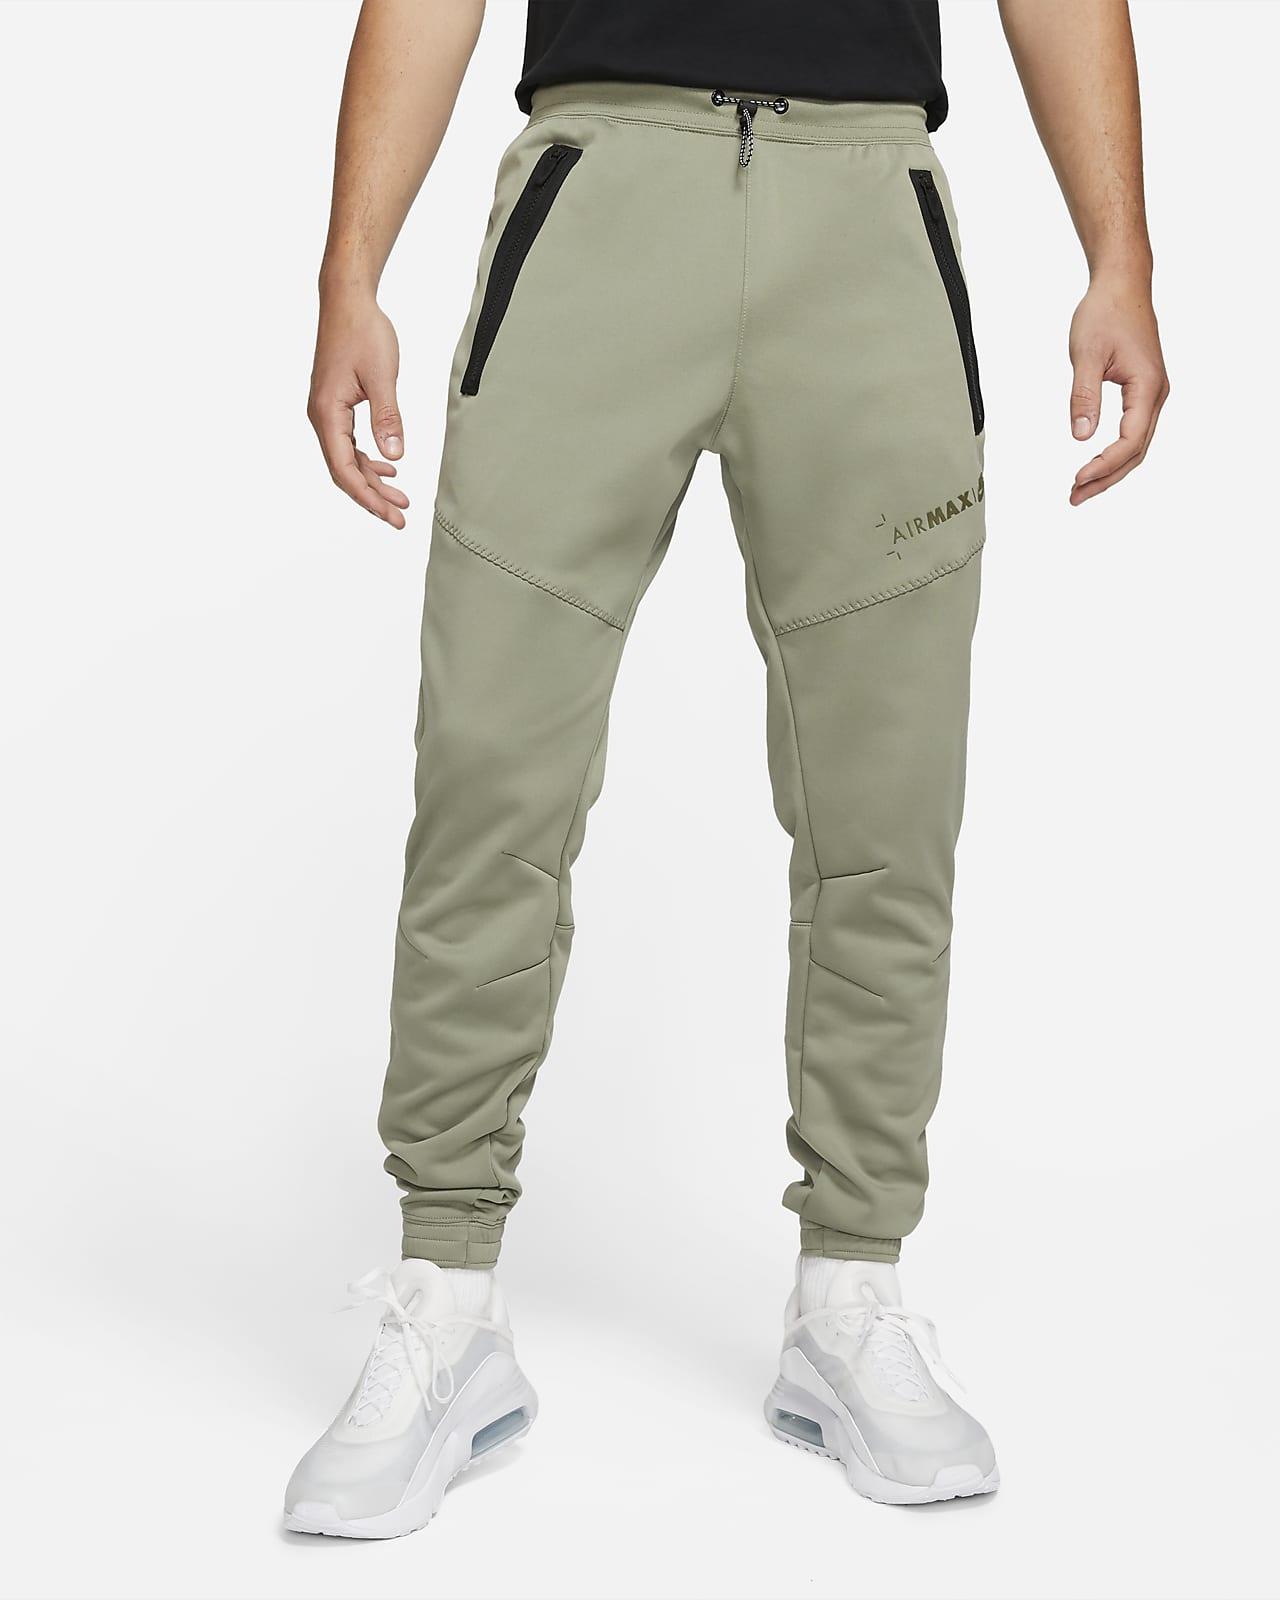 Nike Sportswear Air Max-fleecebukser til mænd